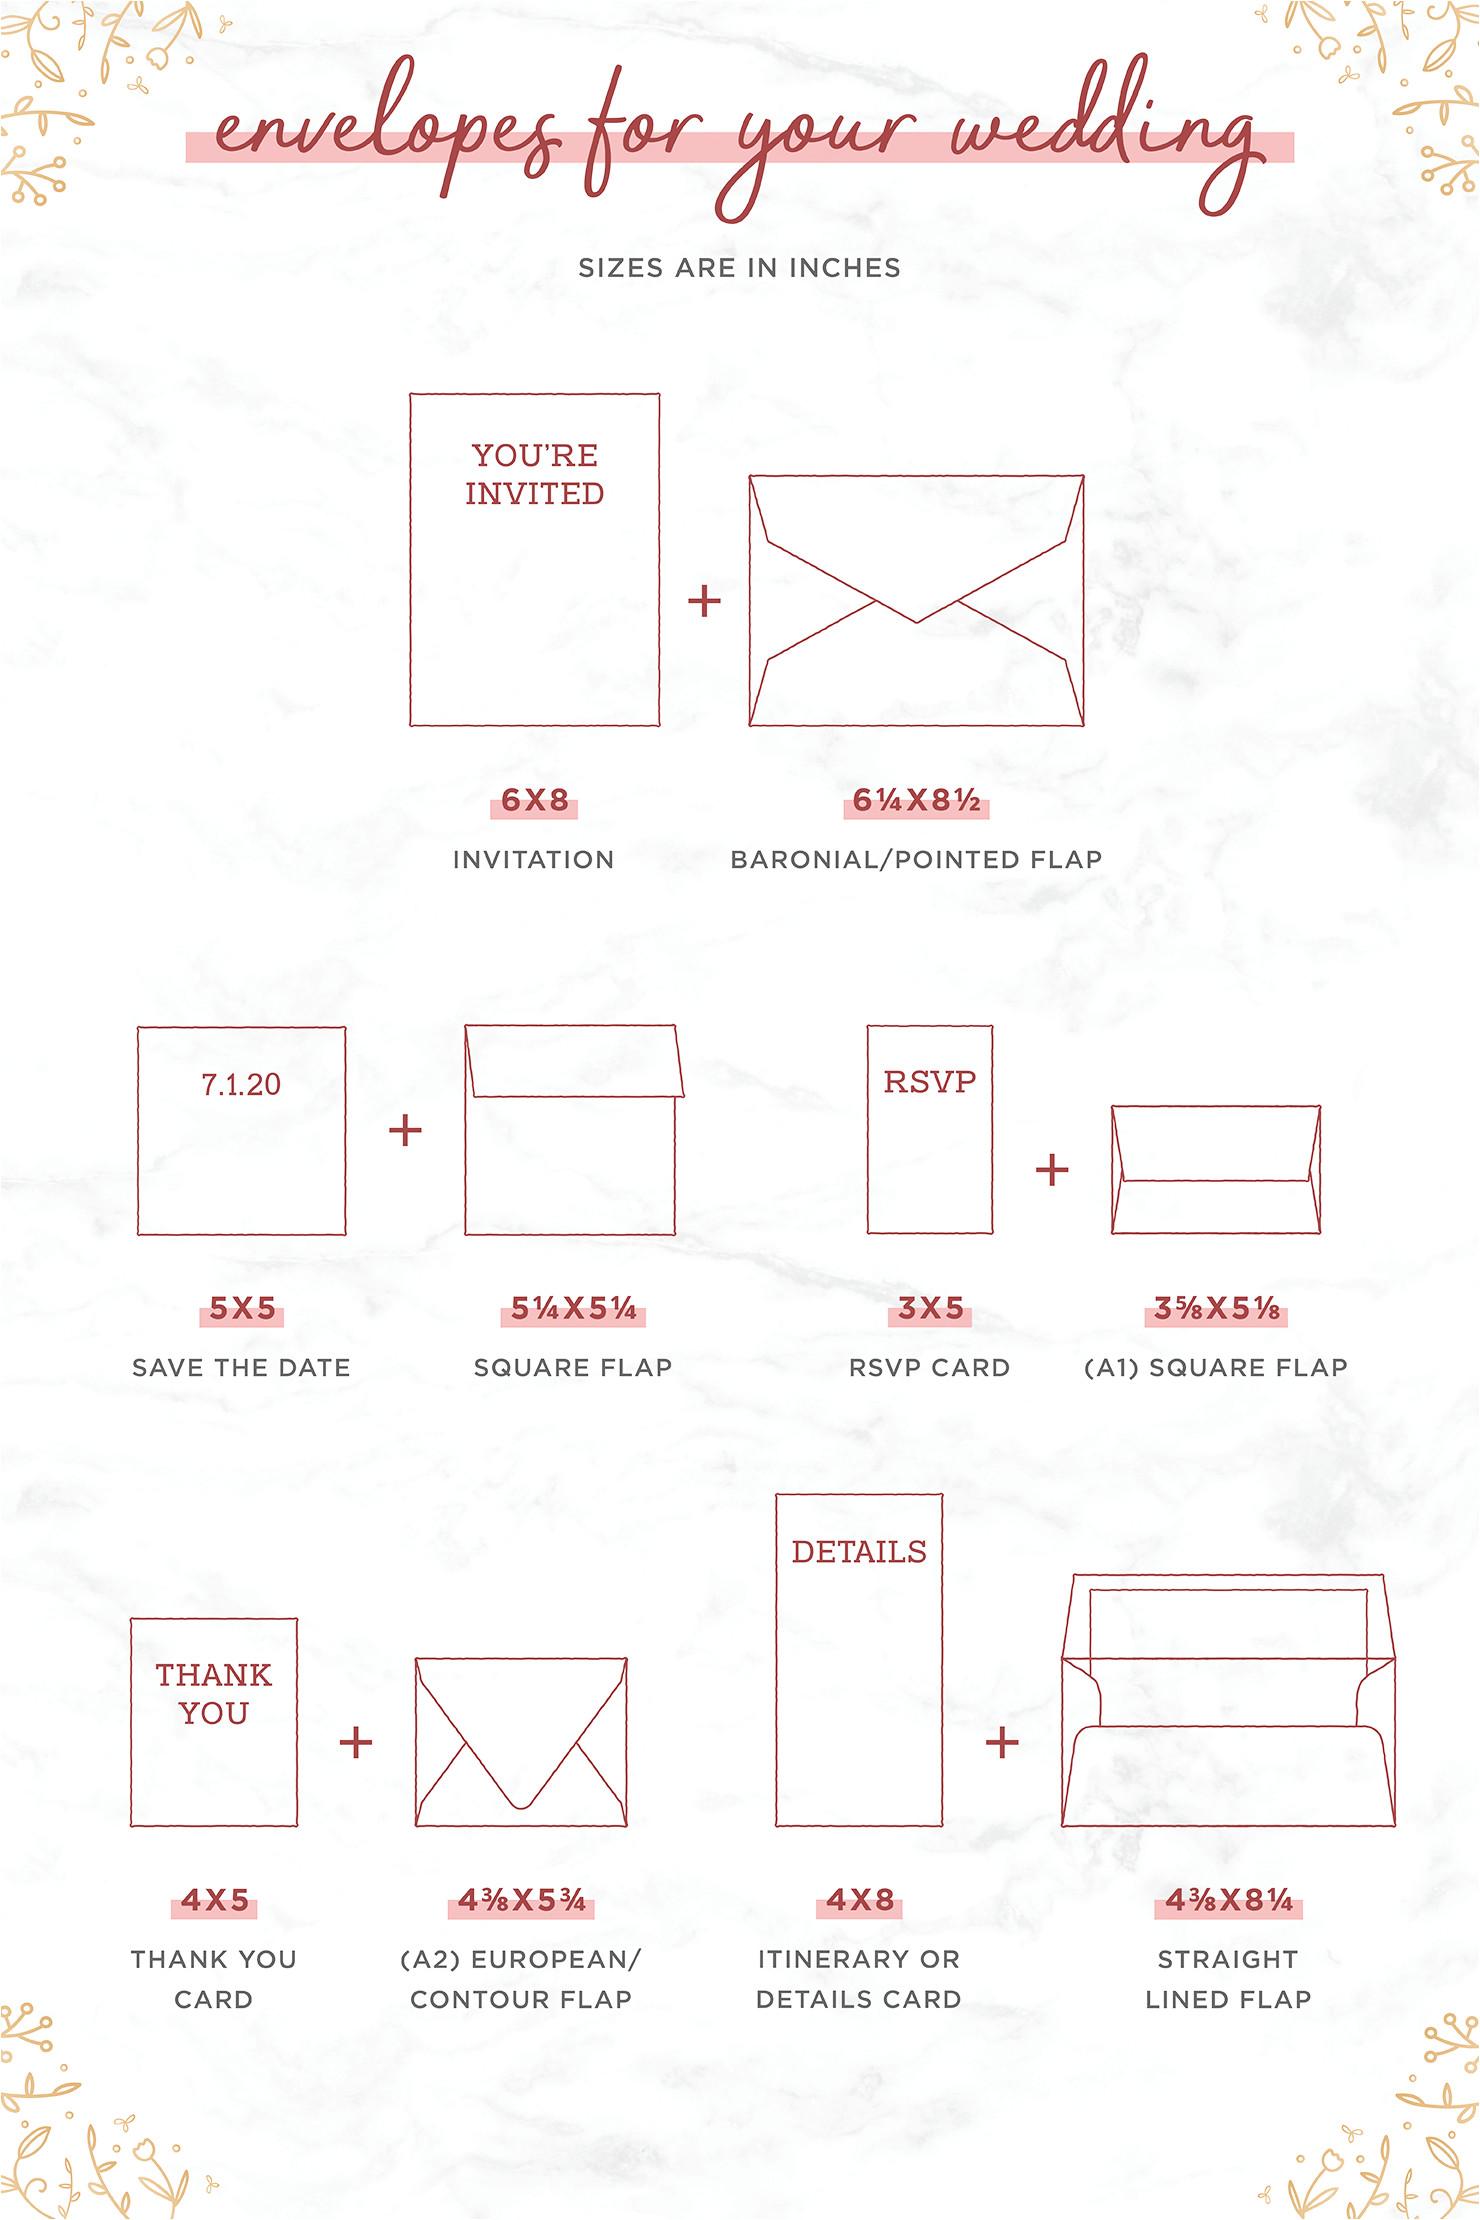 photo album sizes infographic 2x 1 png